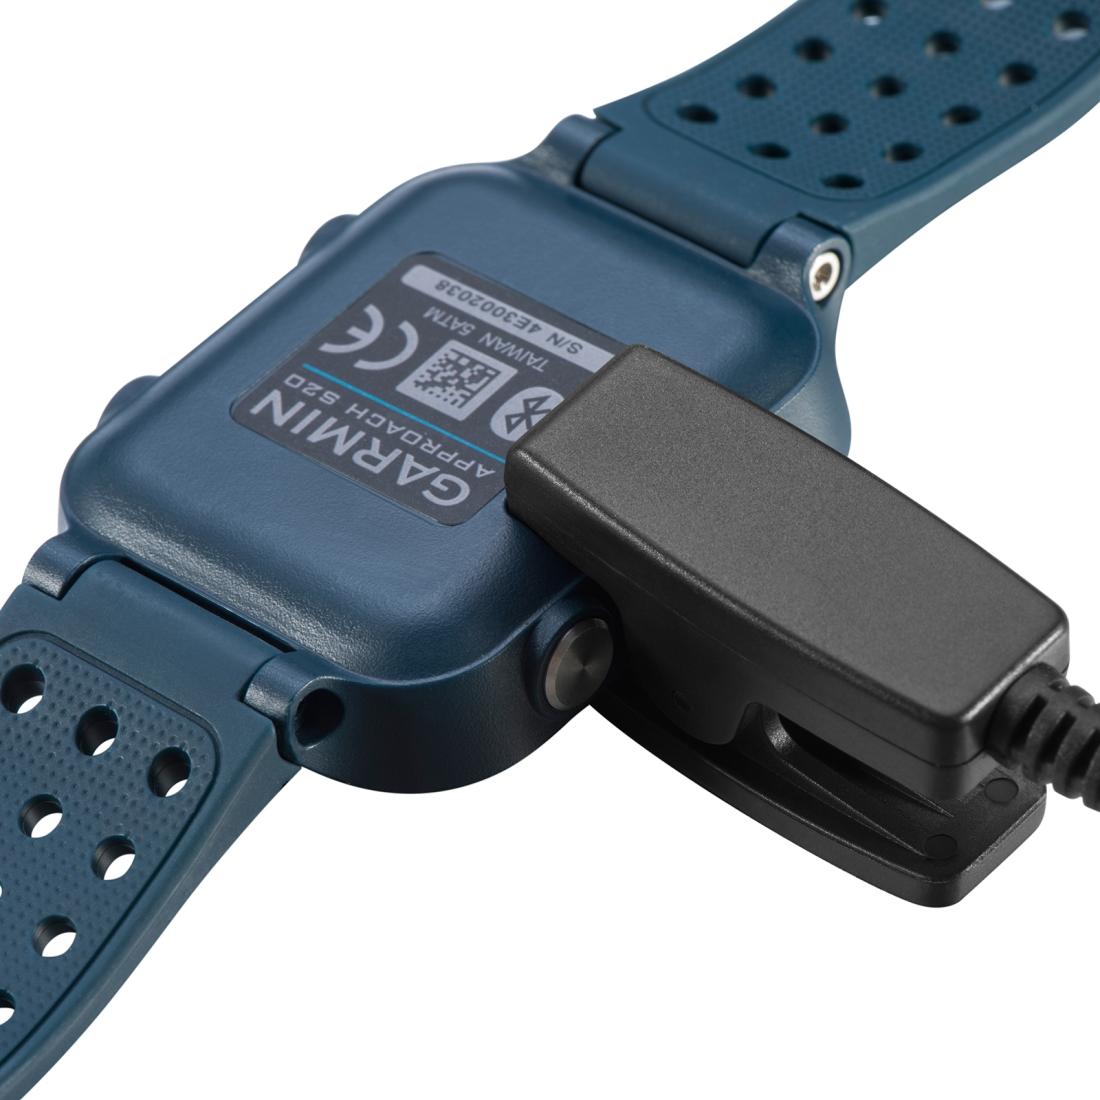 USB Clip Charger Cradle Dock for Garmin Forerunner 735XT 235 230 630 Approach S20 Smart Watch